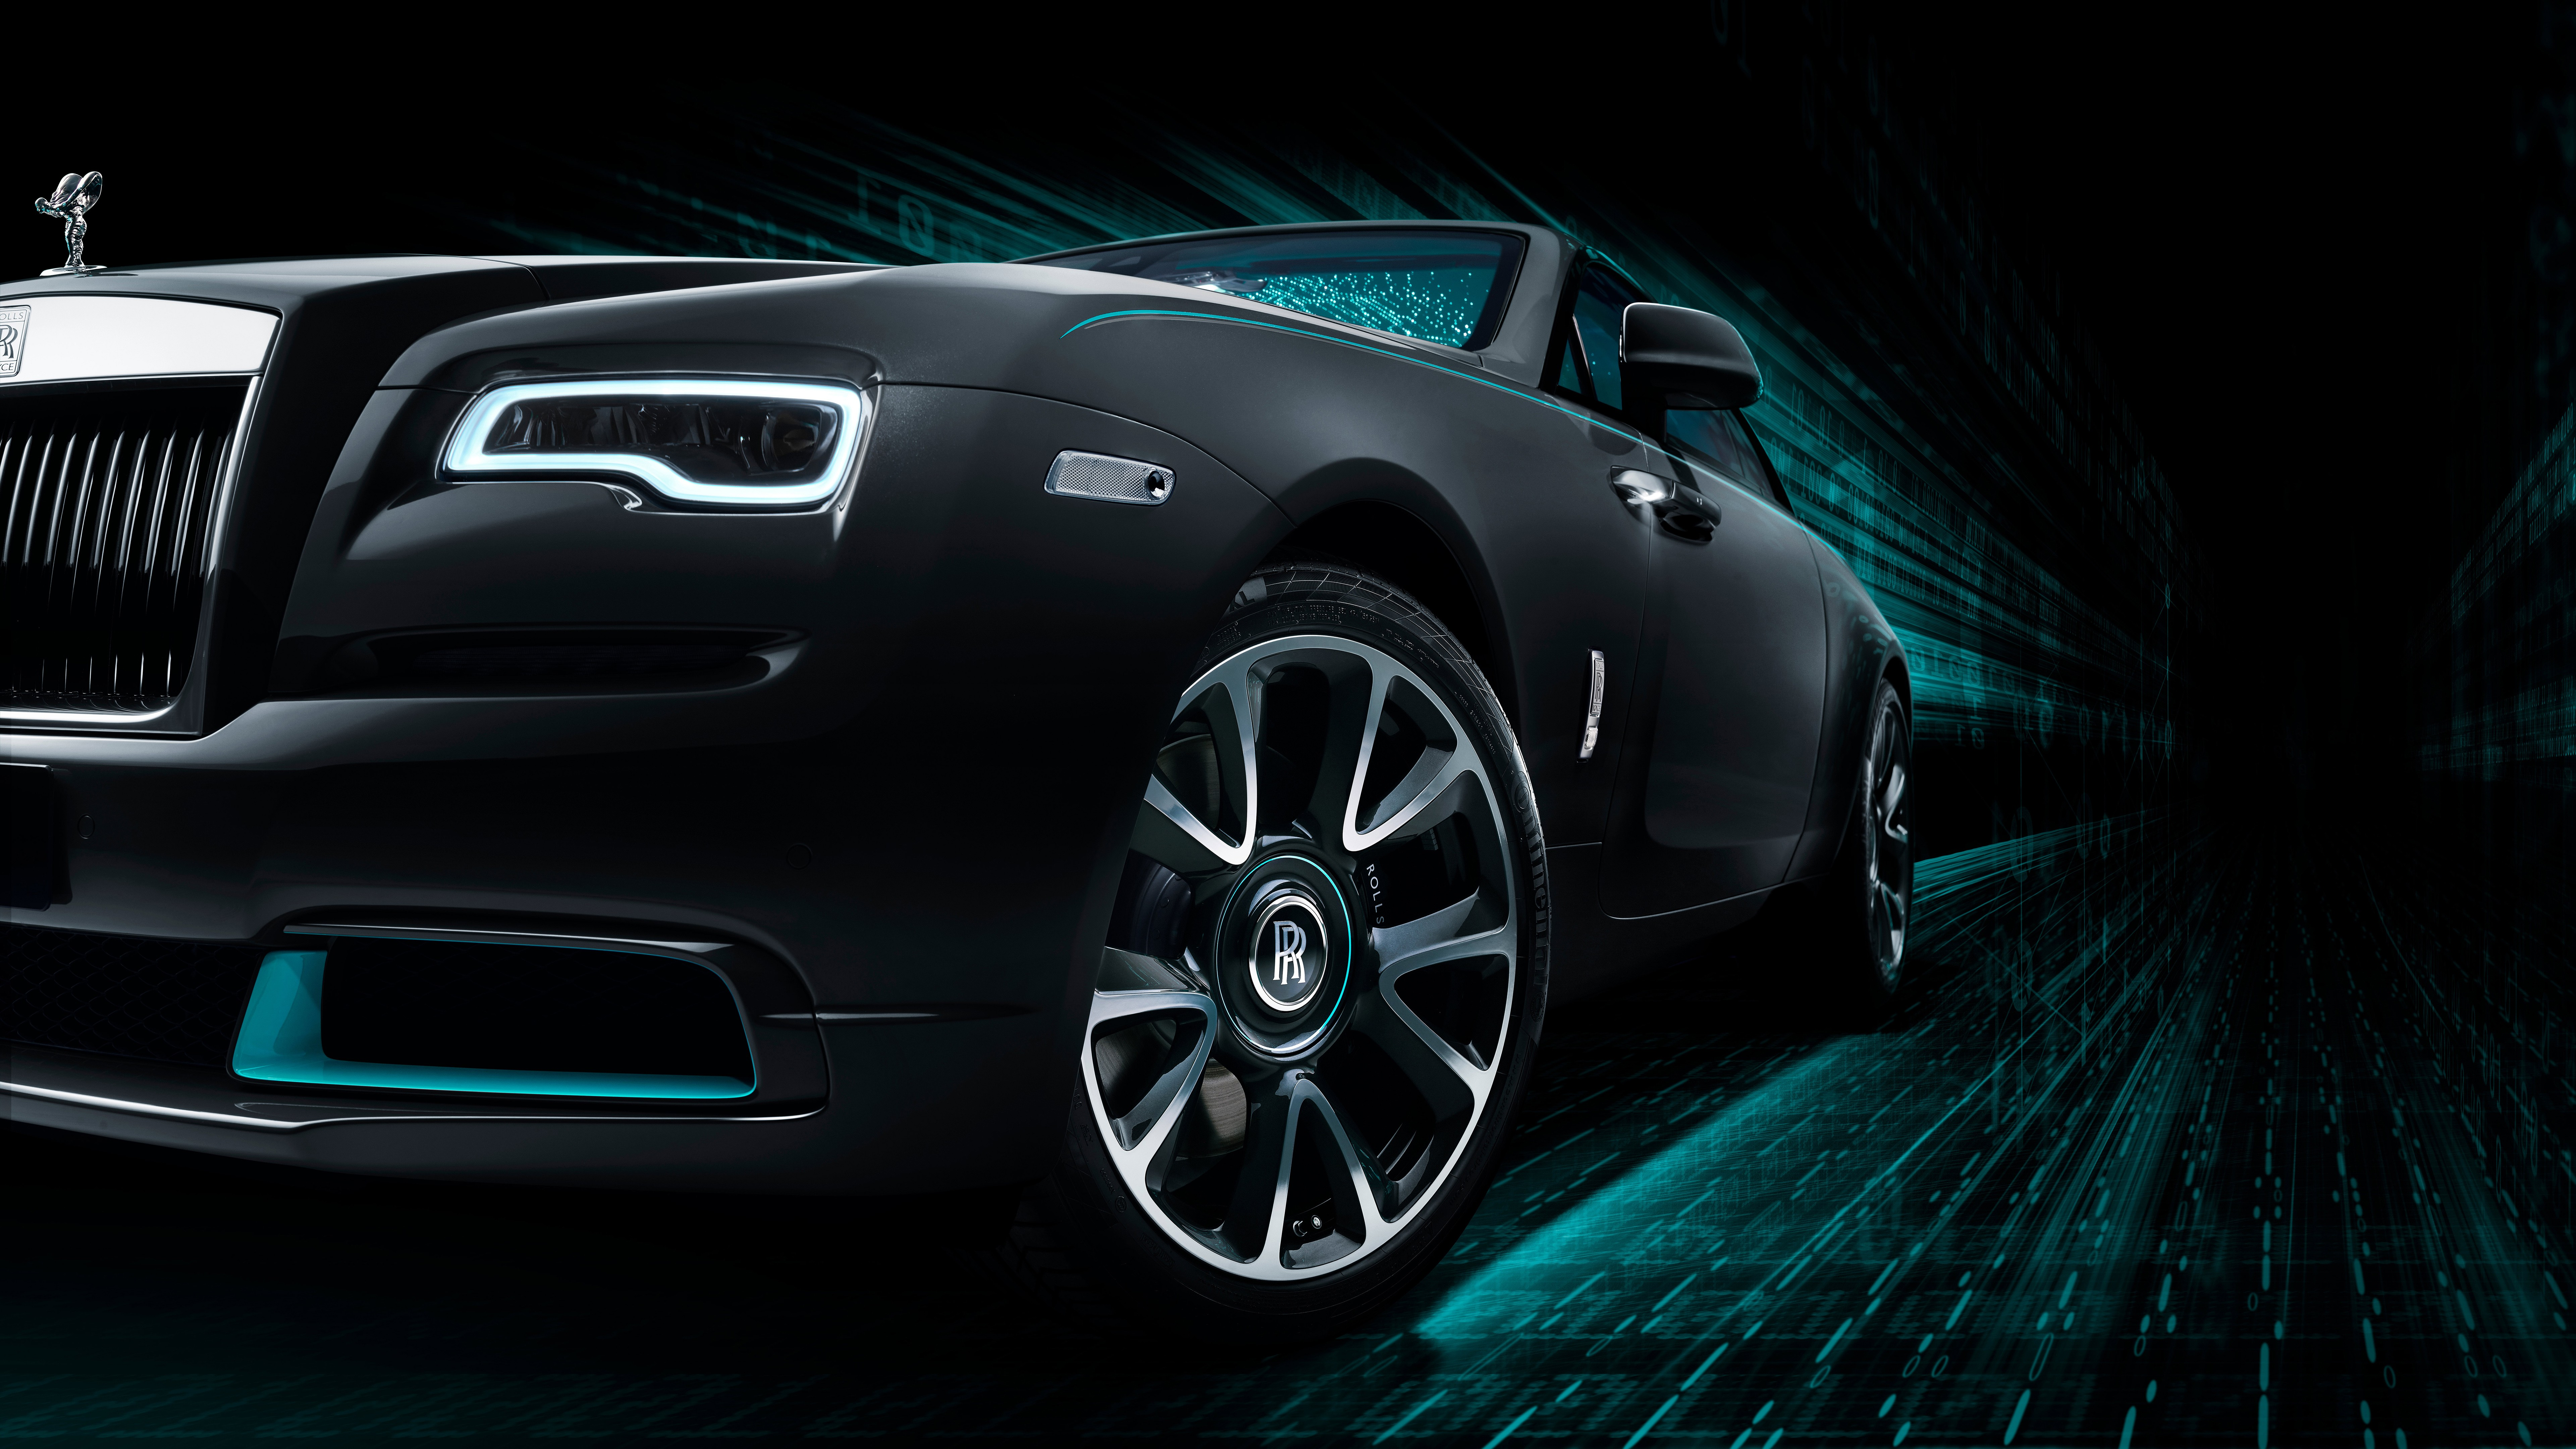 Rolls-Royce Wraith Kryptos Collection 2020 4K 8K Wallpaper ...